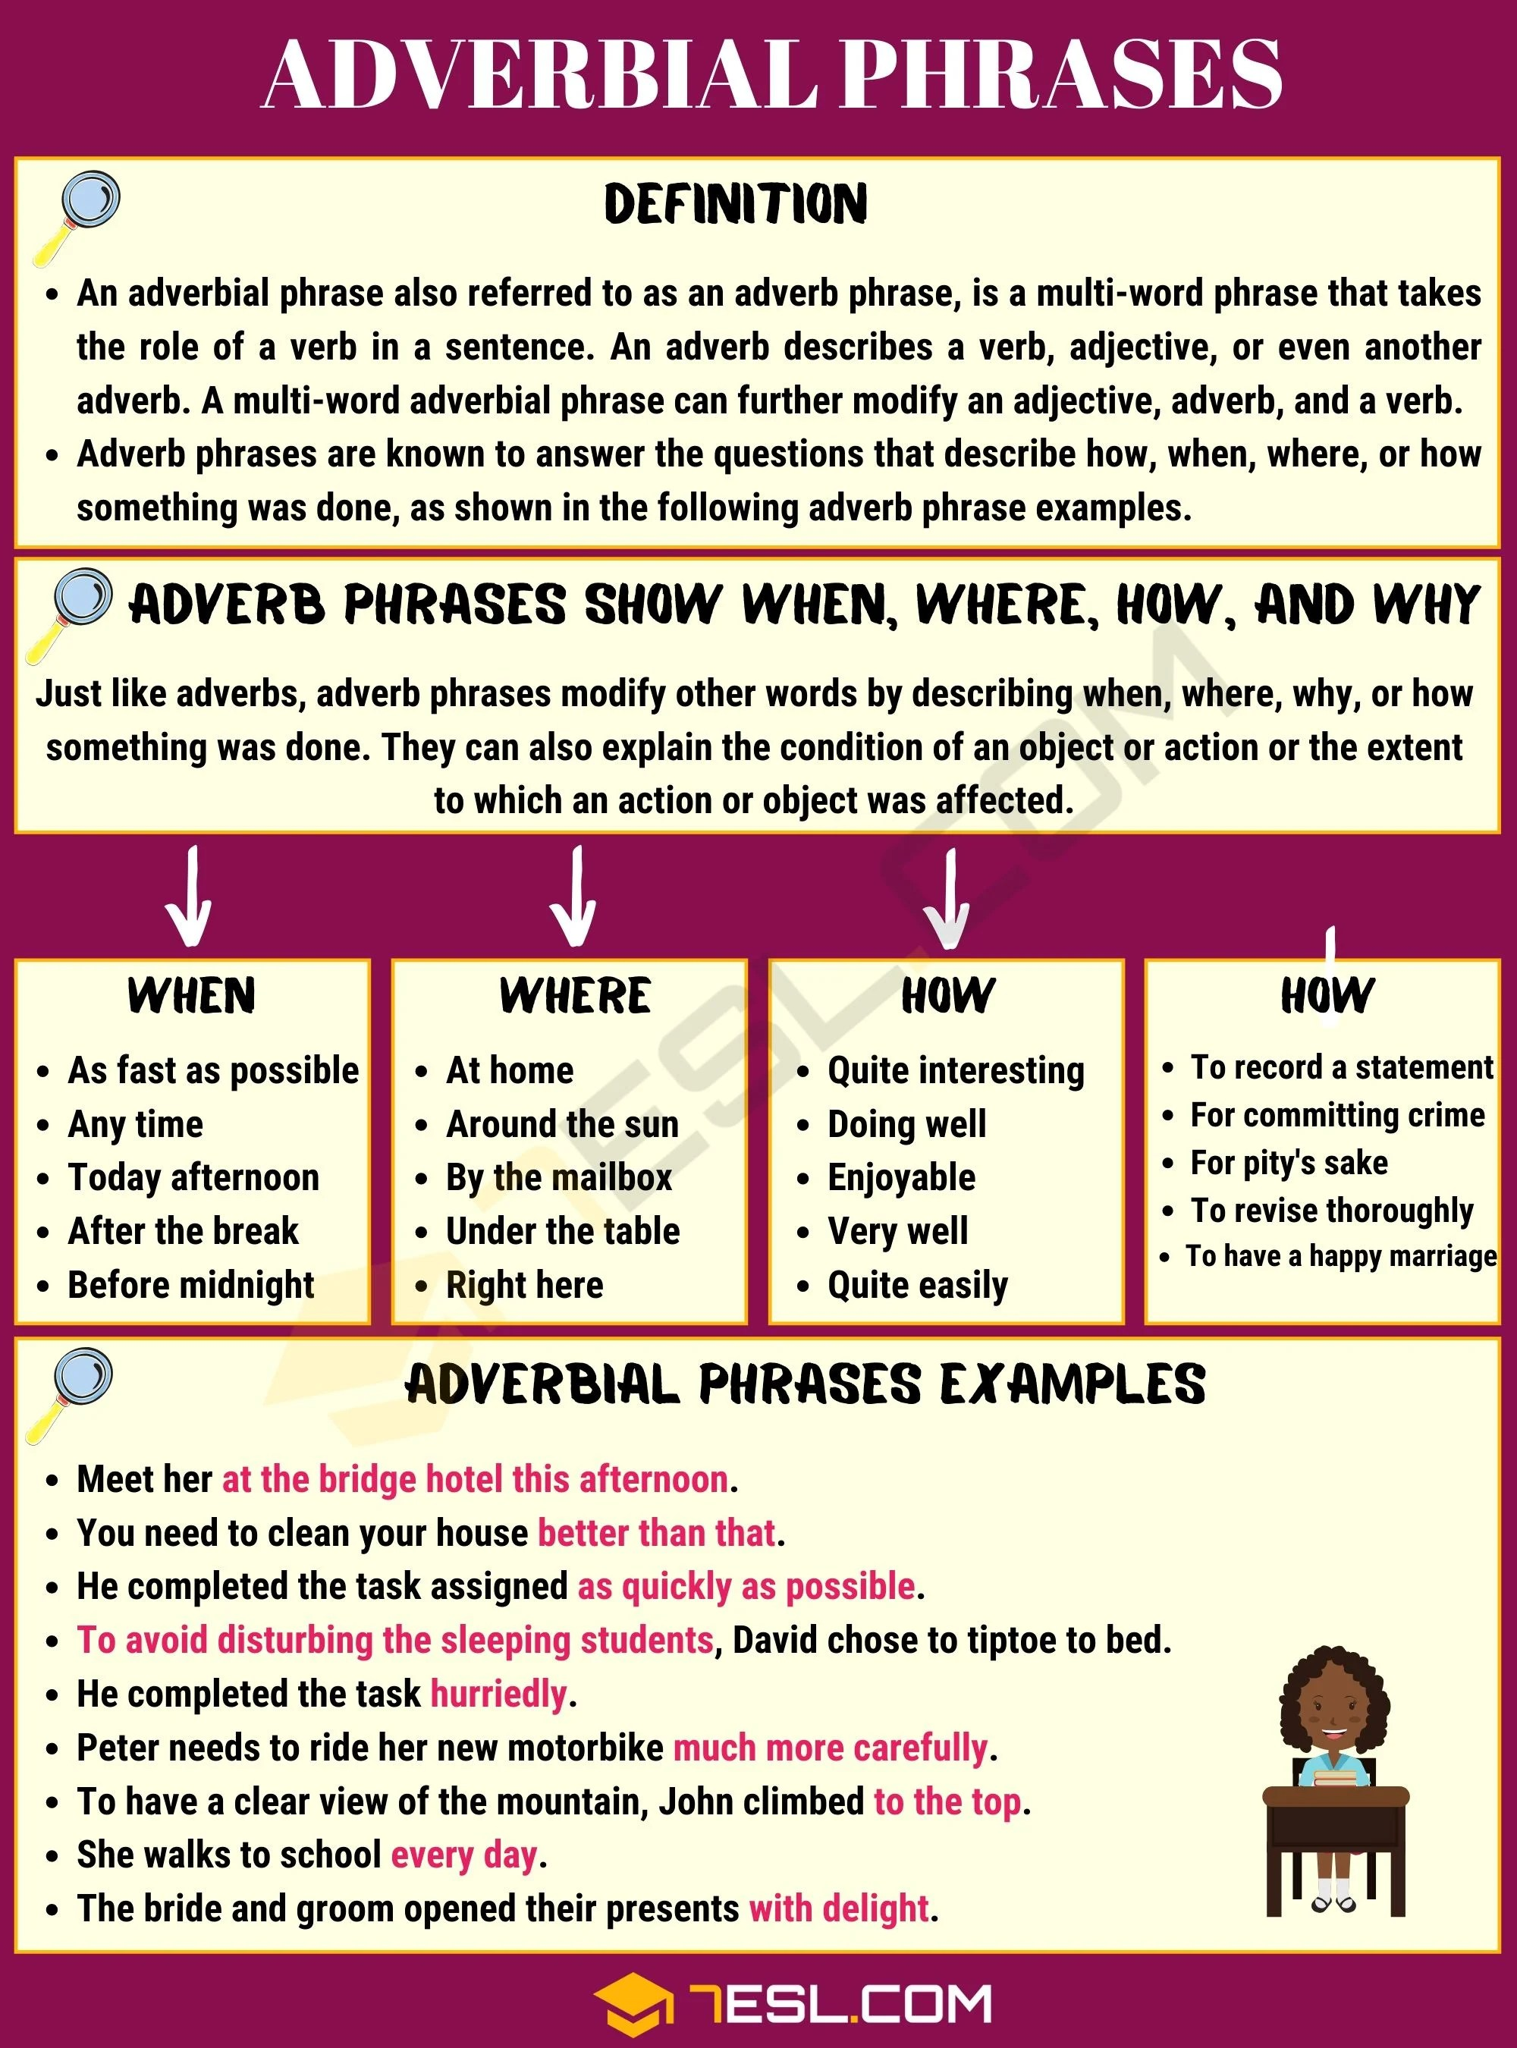 Adverbial Phrase Adverb Phrase Definition Usage And